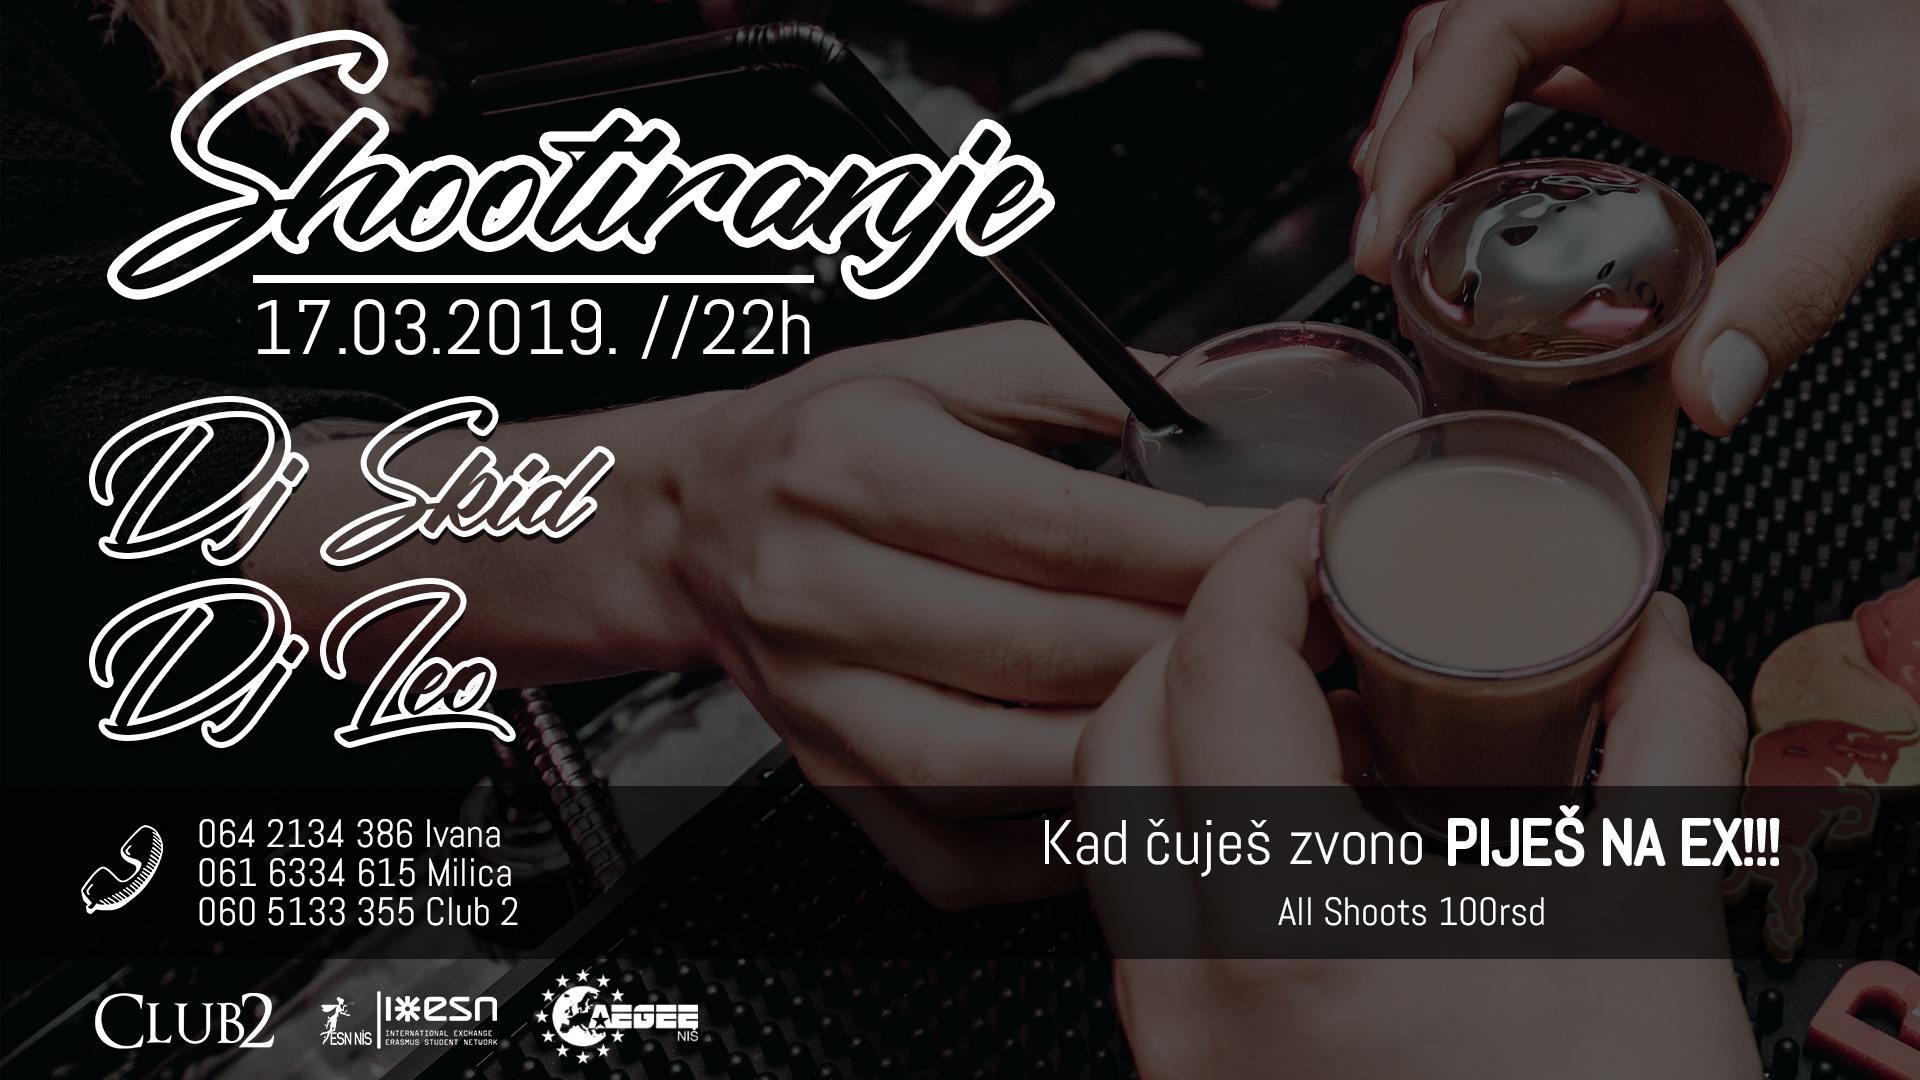 Shootiranje - Tematska žurka by AEGEE-Niš & Esn Niš